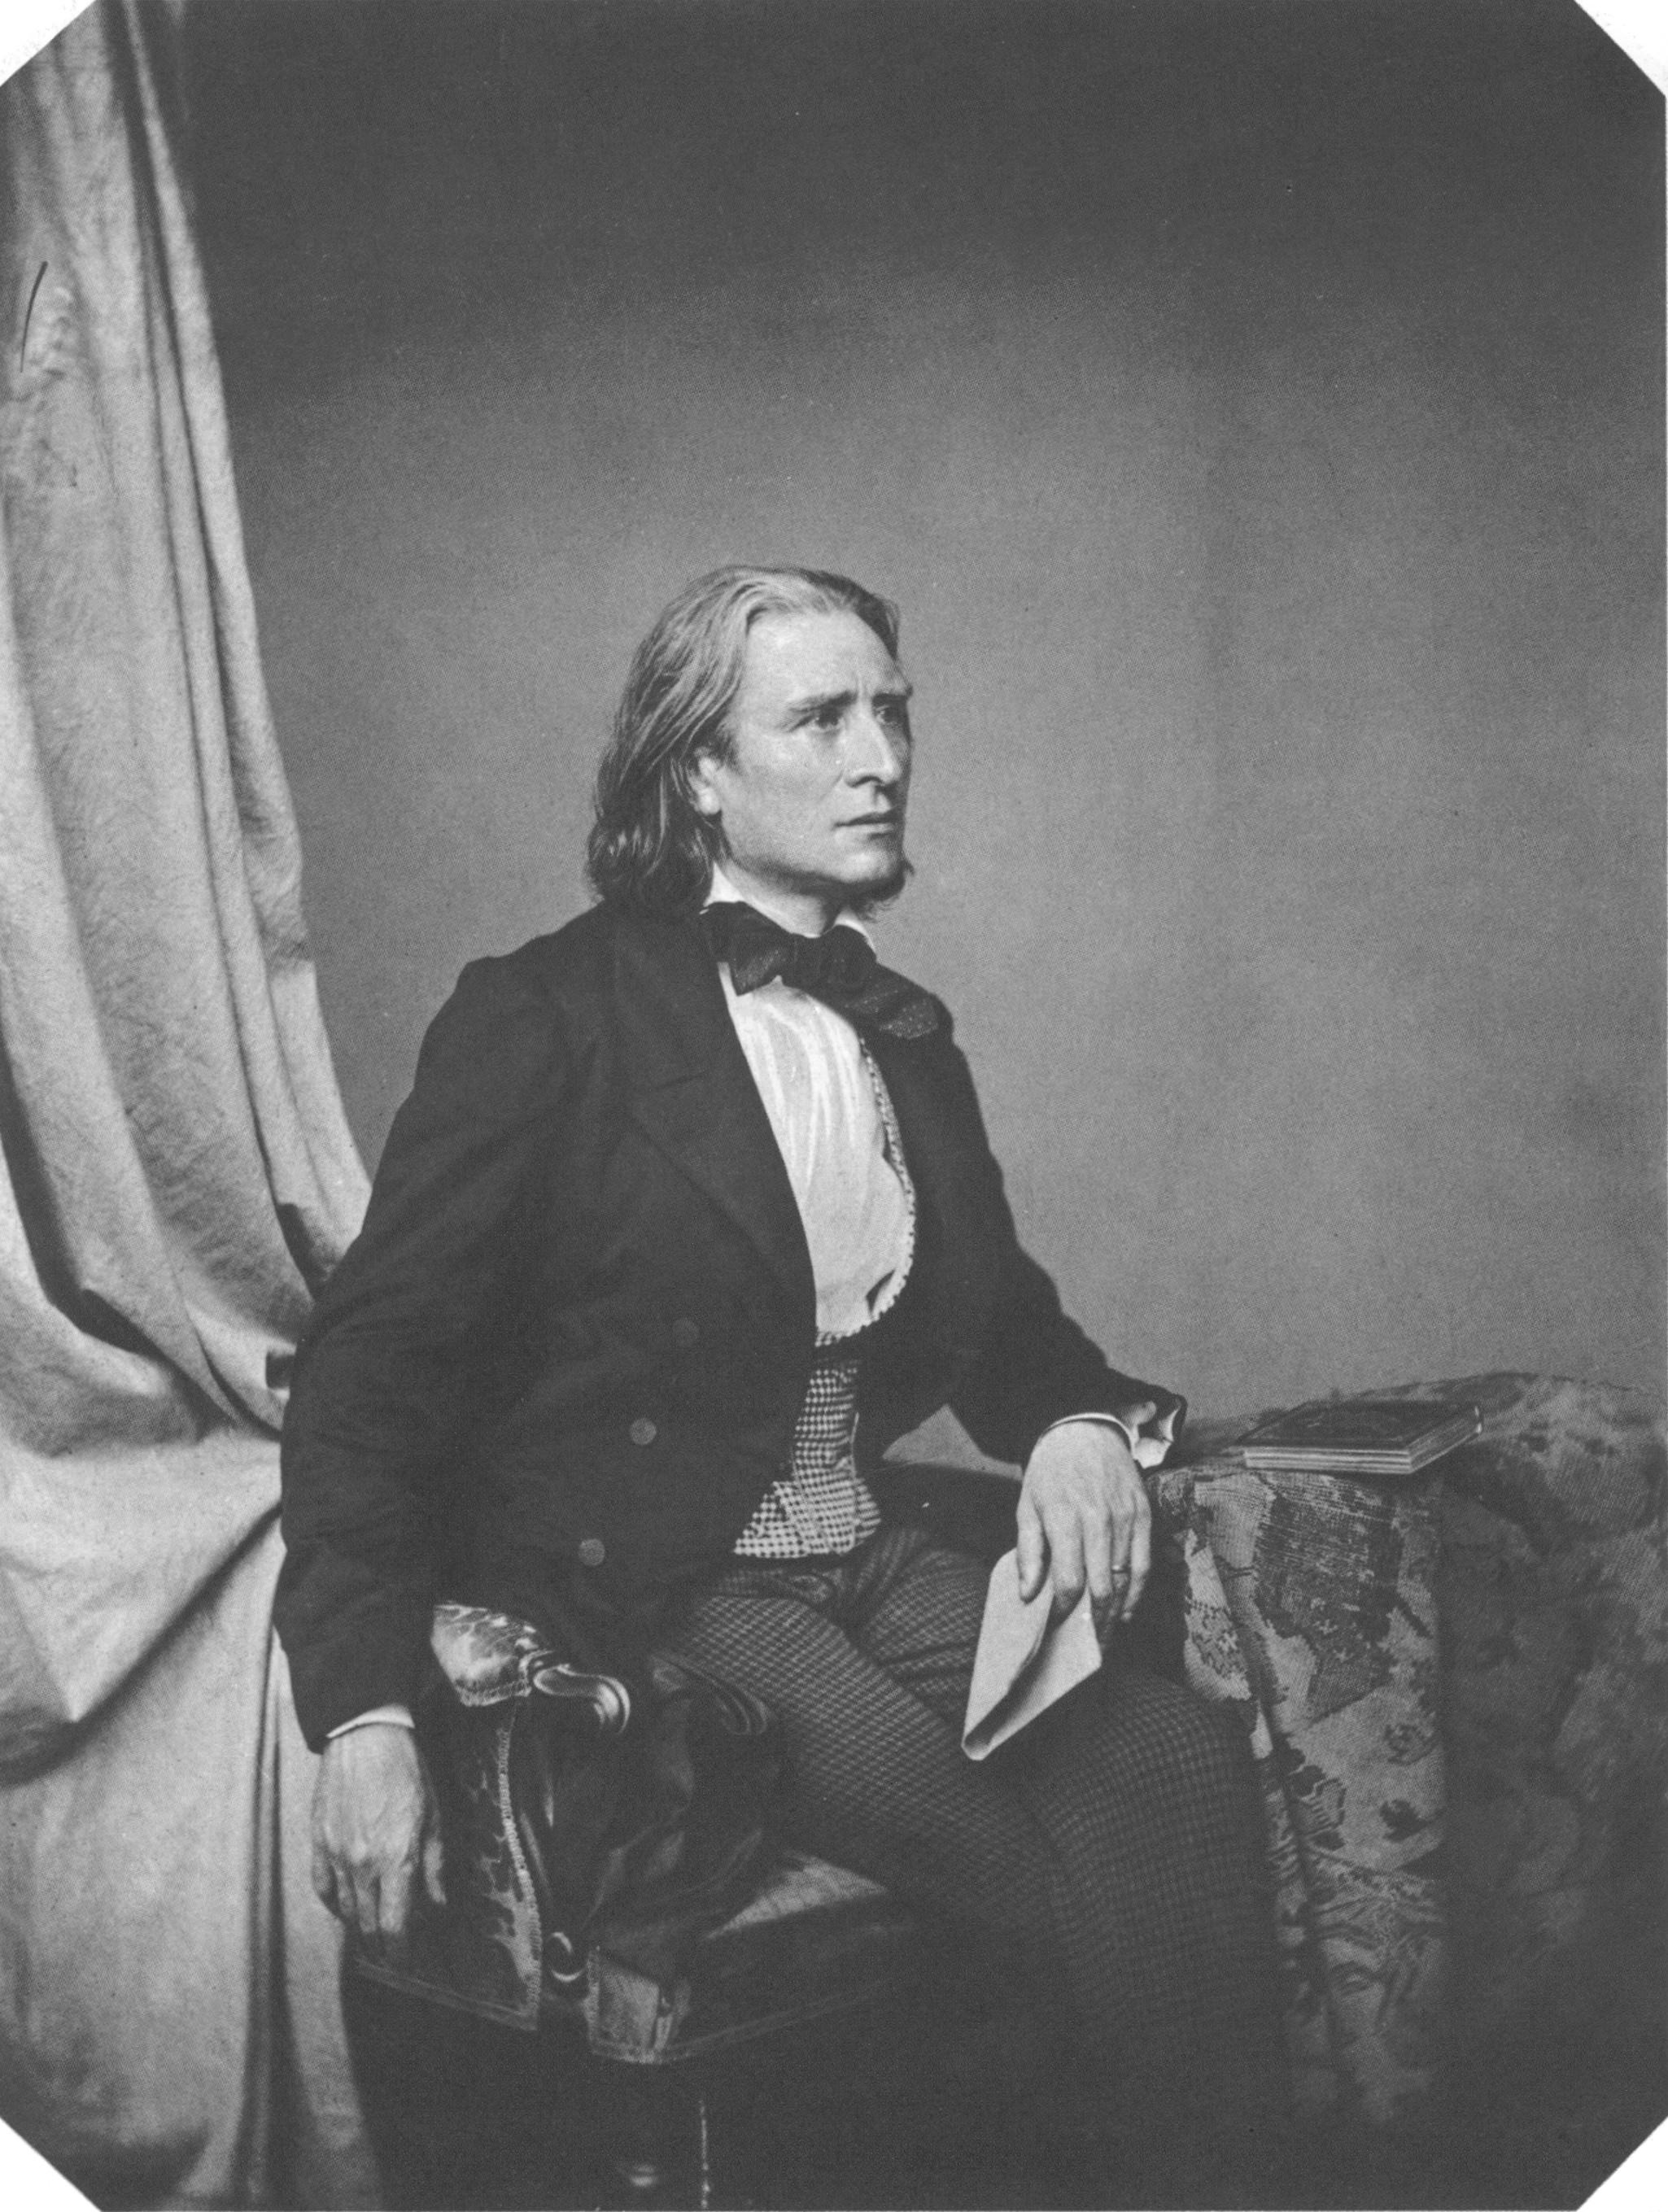 http://upload.wikimedia.org/wikipedia/commons/0/0a/Franz_Liszt.jpg